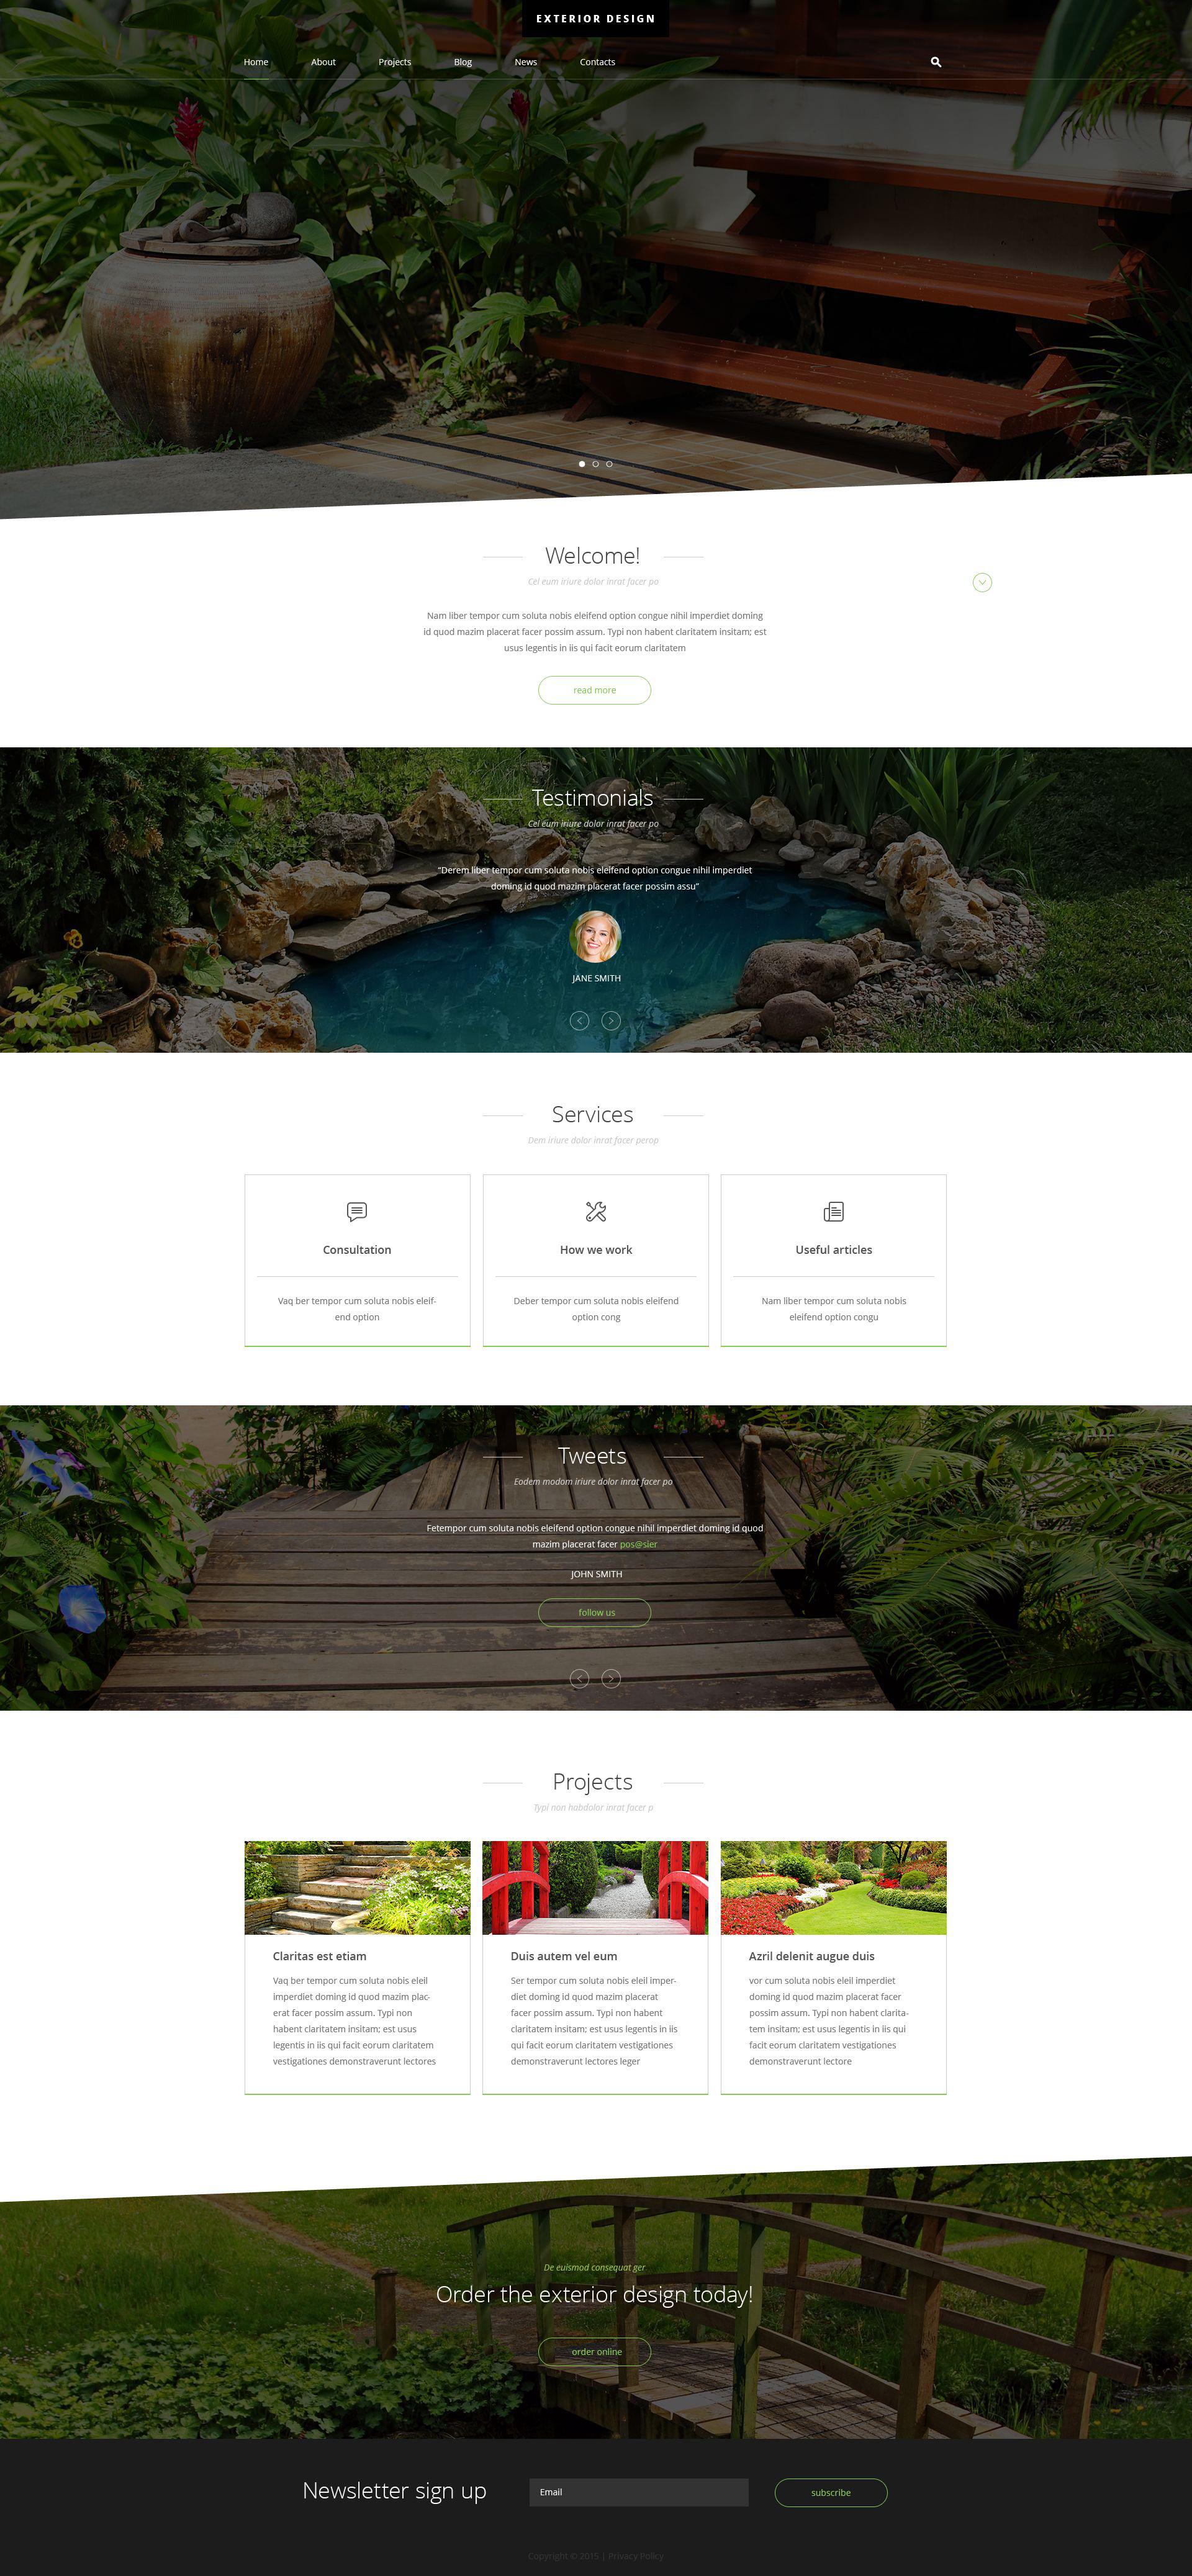 Exterior Design Joomla Template - screenshot